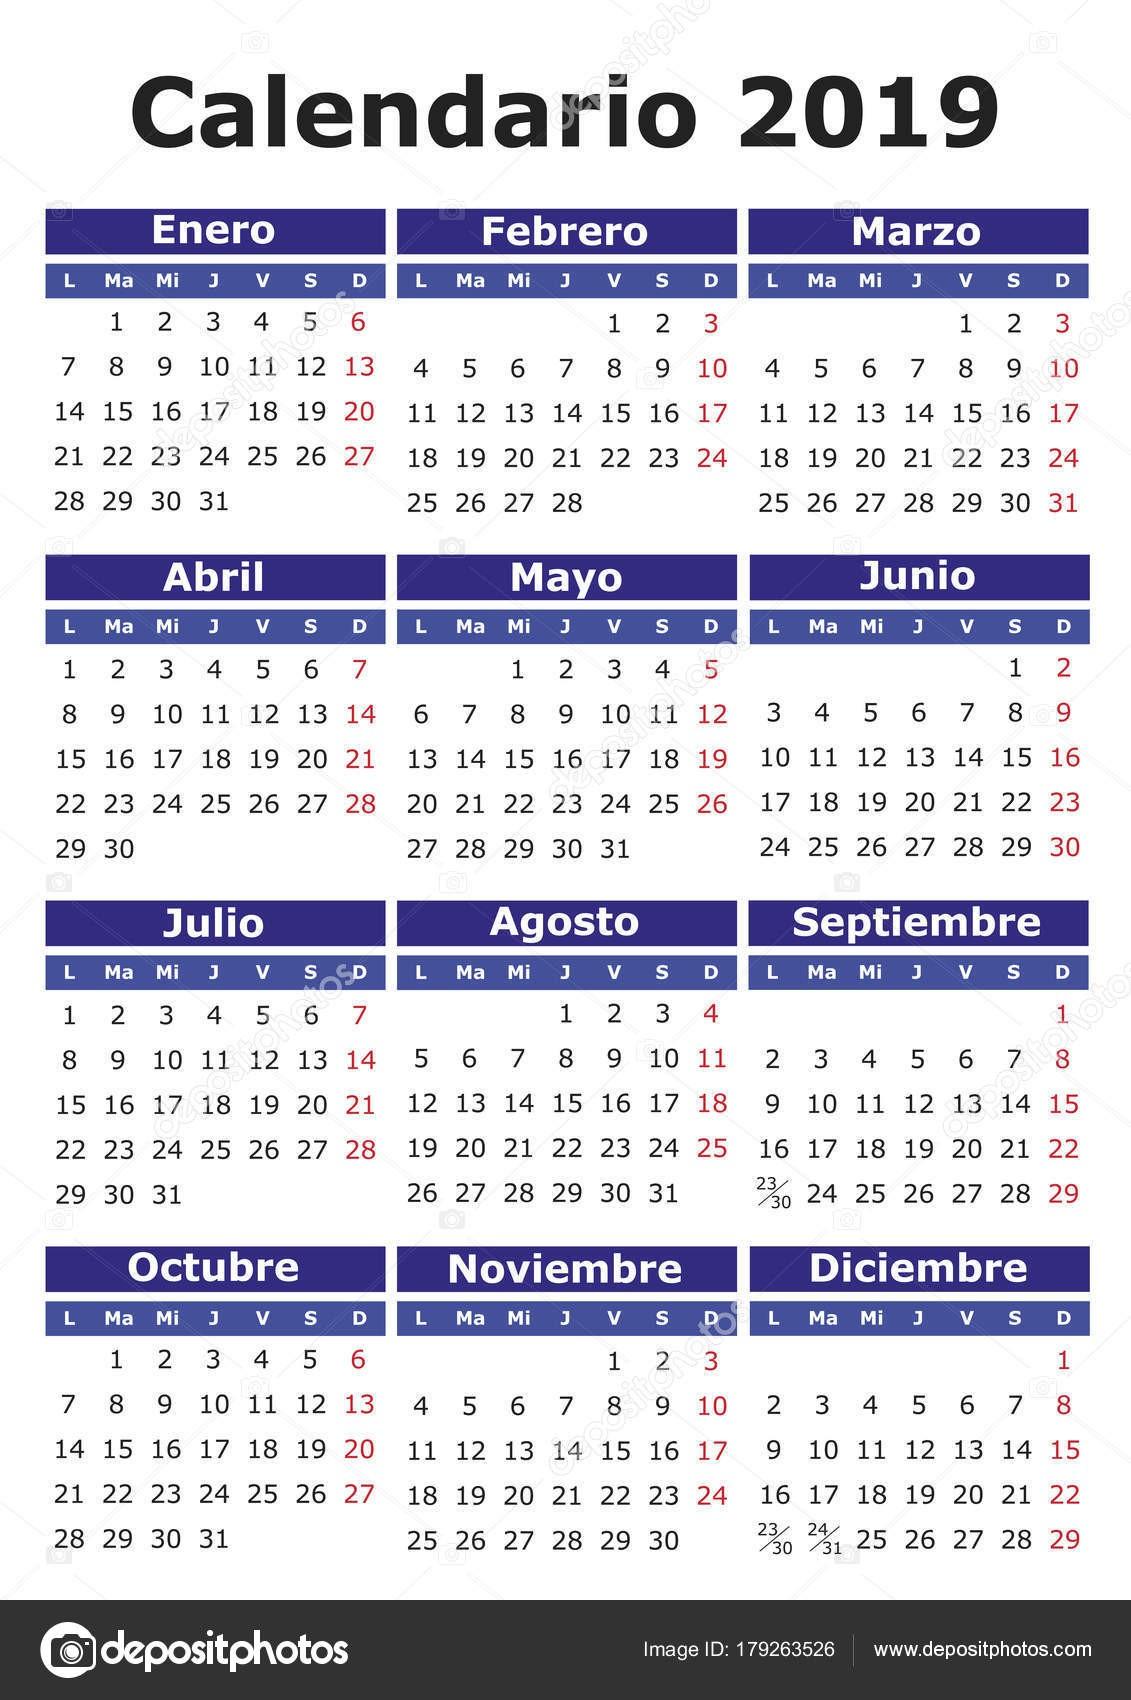 Calendario de vector de 2019 en espa±ol Fácil de editar y aplicar Calendario 2019 dias festivos mexico 2019 — Vector de alfonsodetomas — Vector de